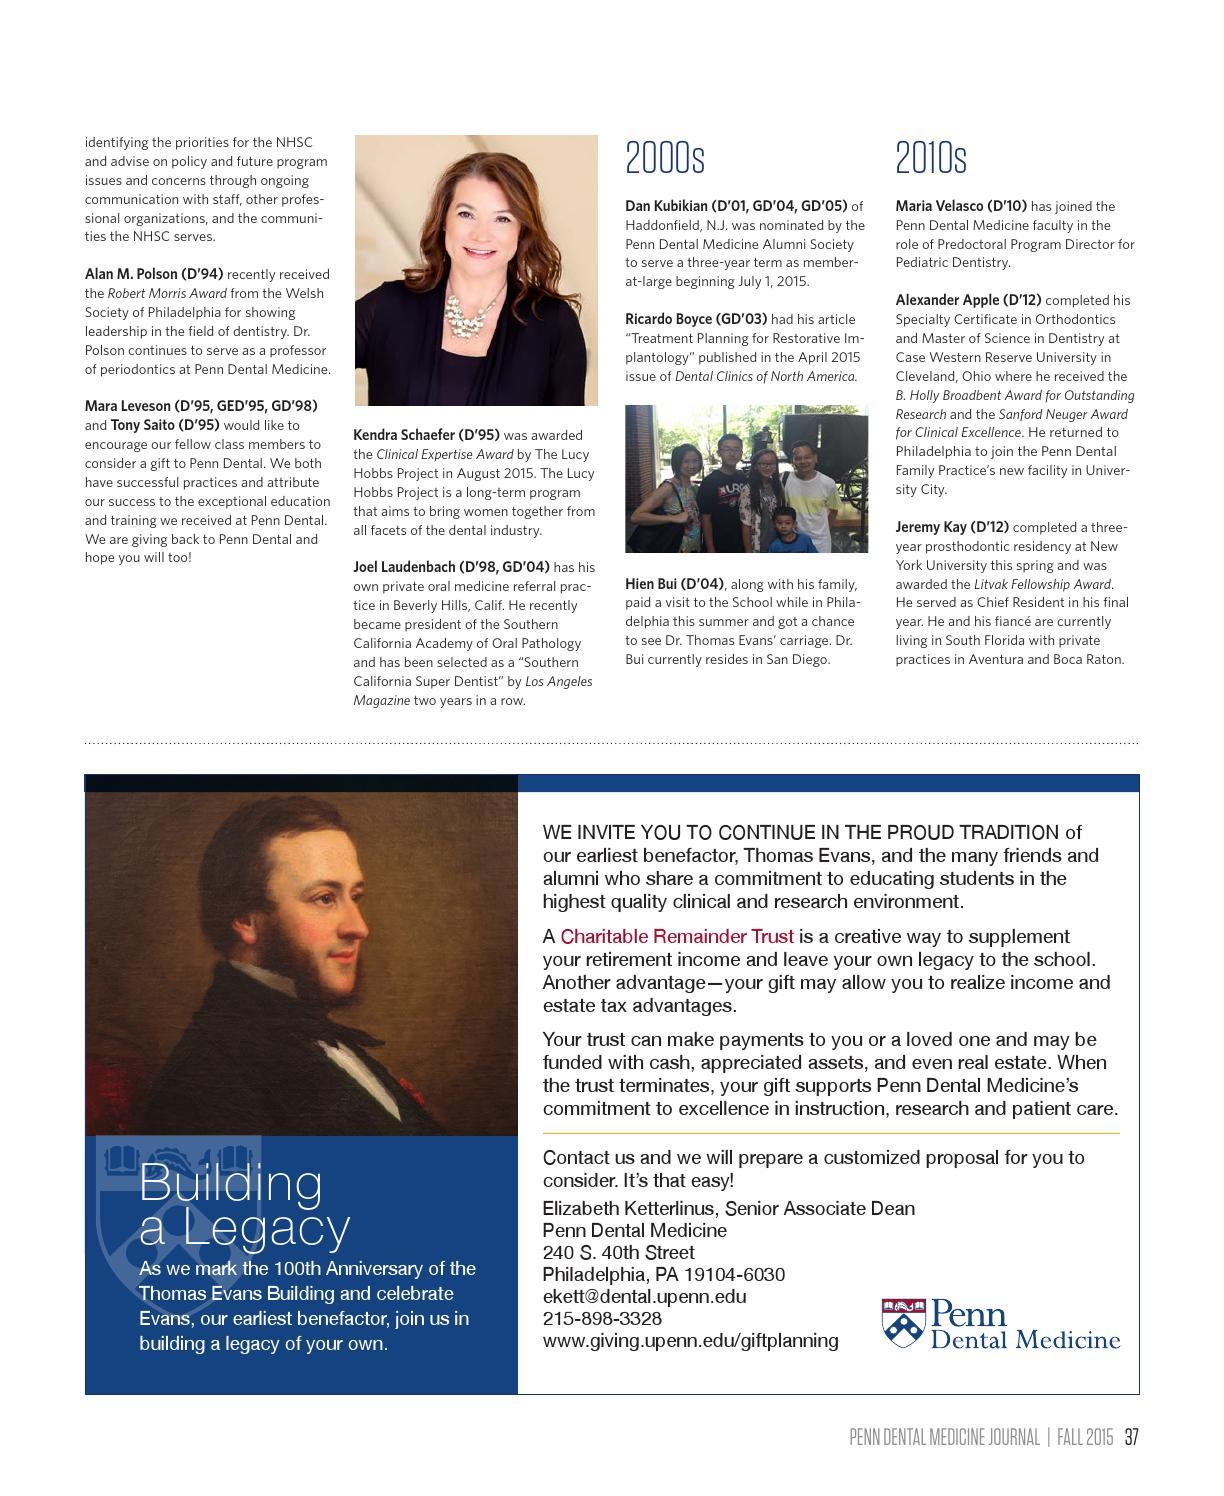 Penn Dental Medicine Journal Fall 2015 By Penn Dental Medicine Issuu